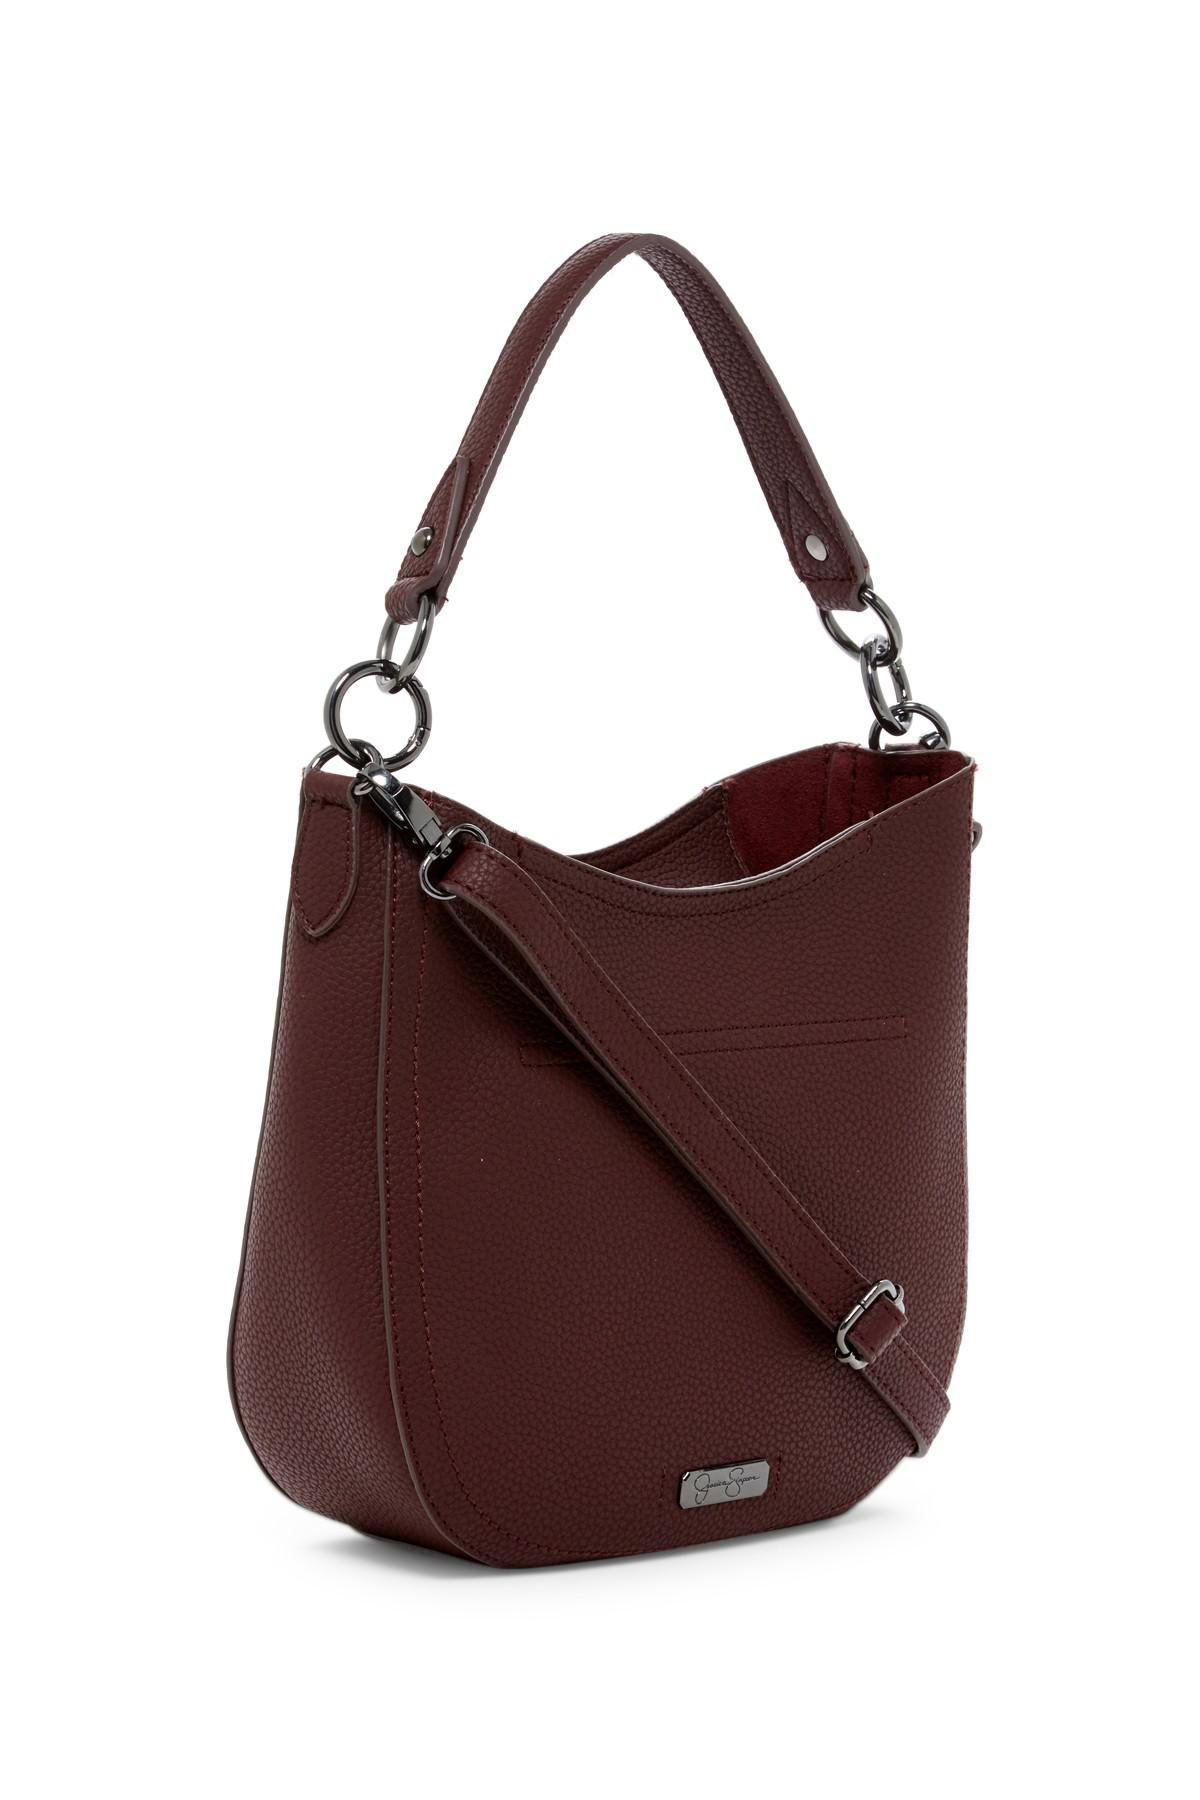 48db79b02659 Lyst - Jessica Simpson Elenore Crossbody Hobo Bag